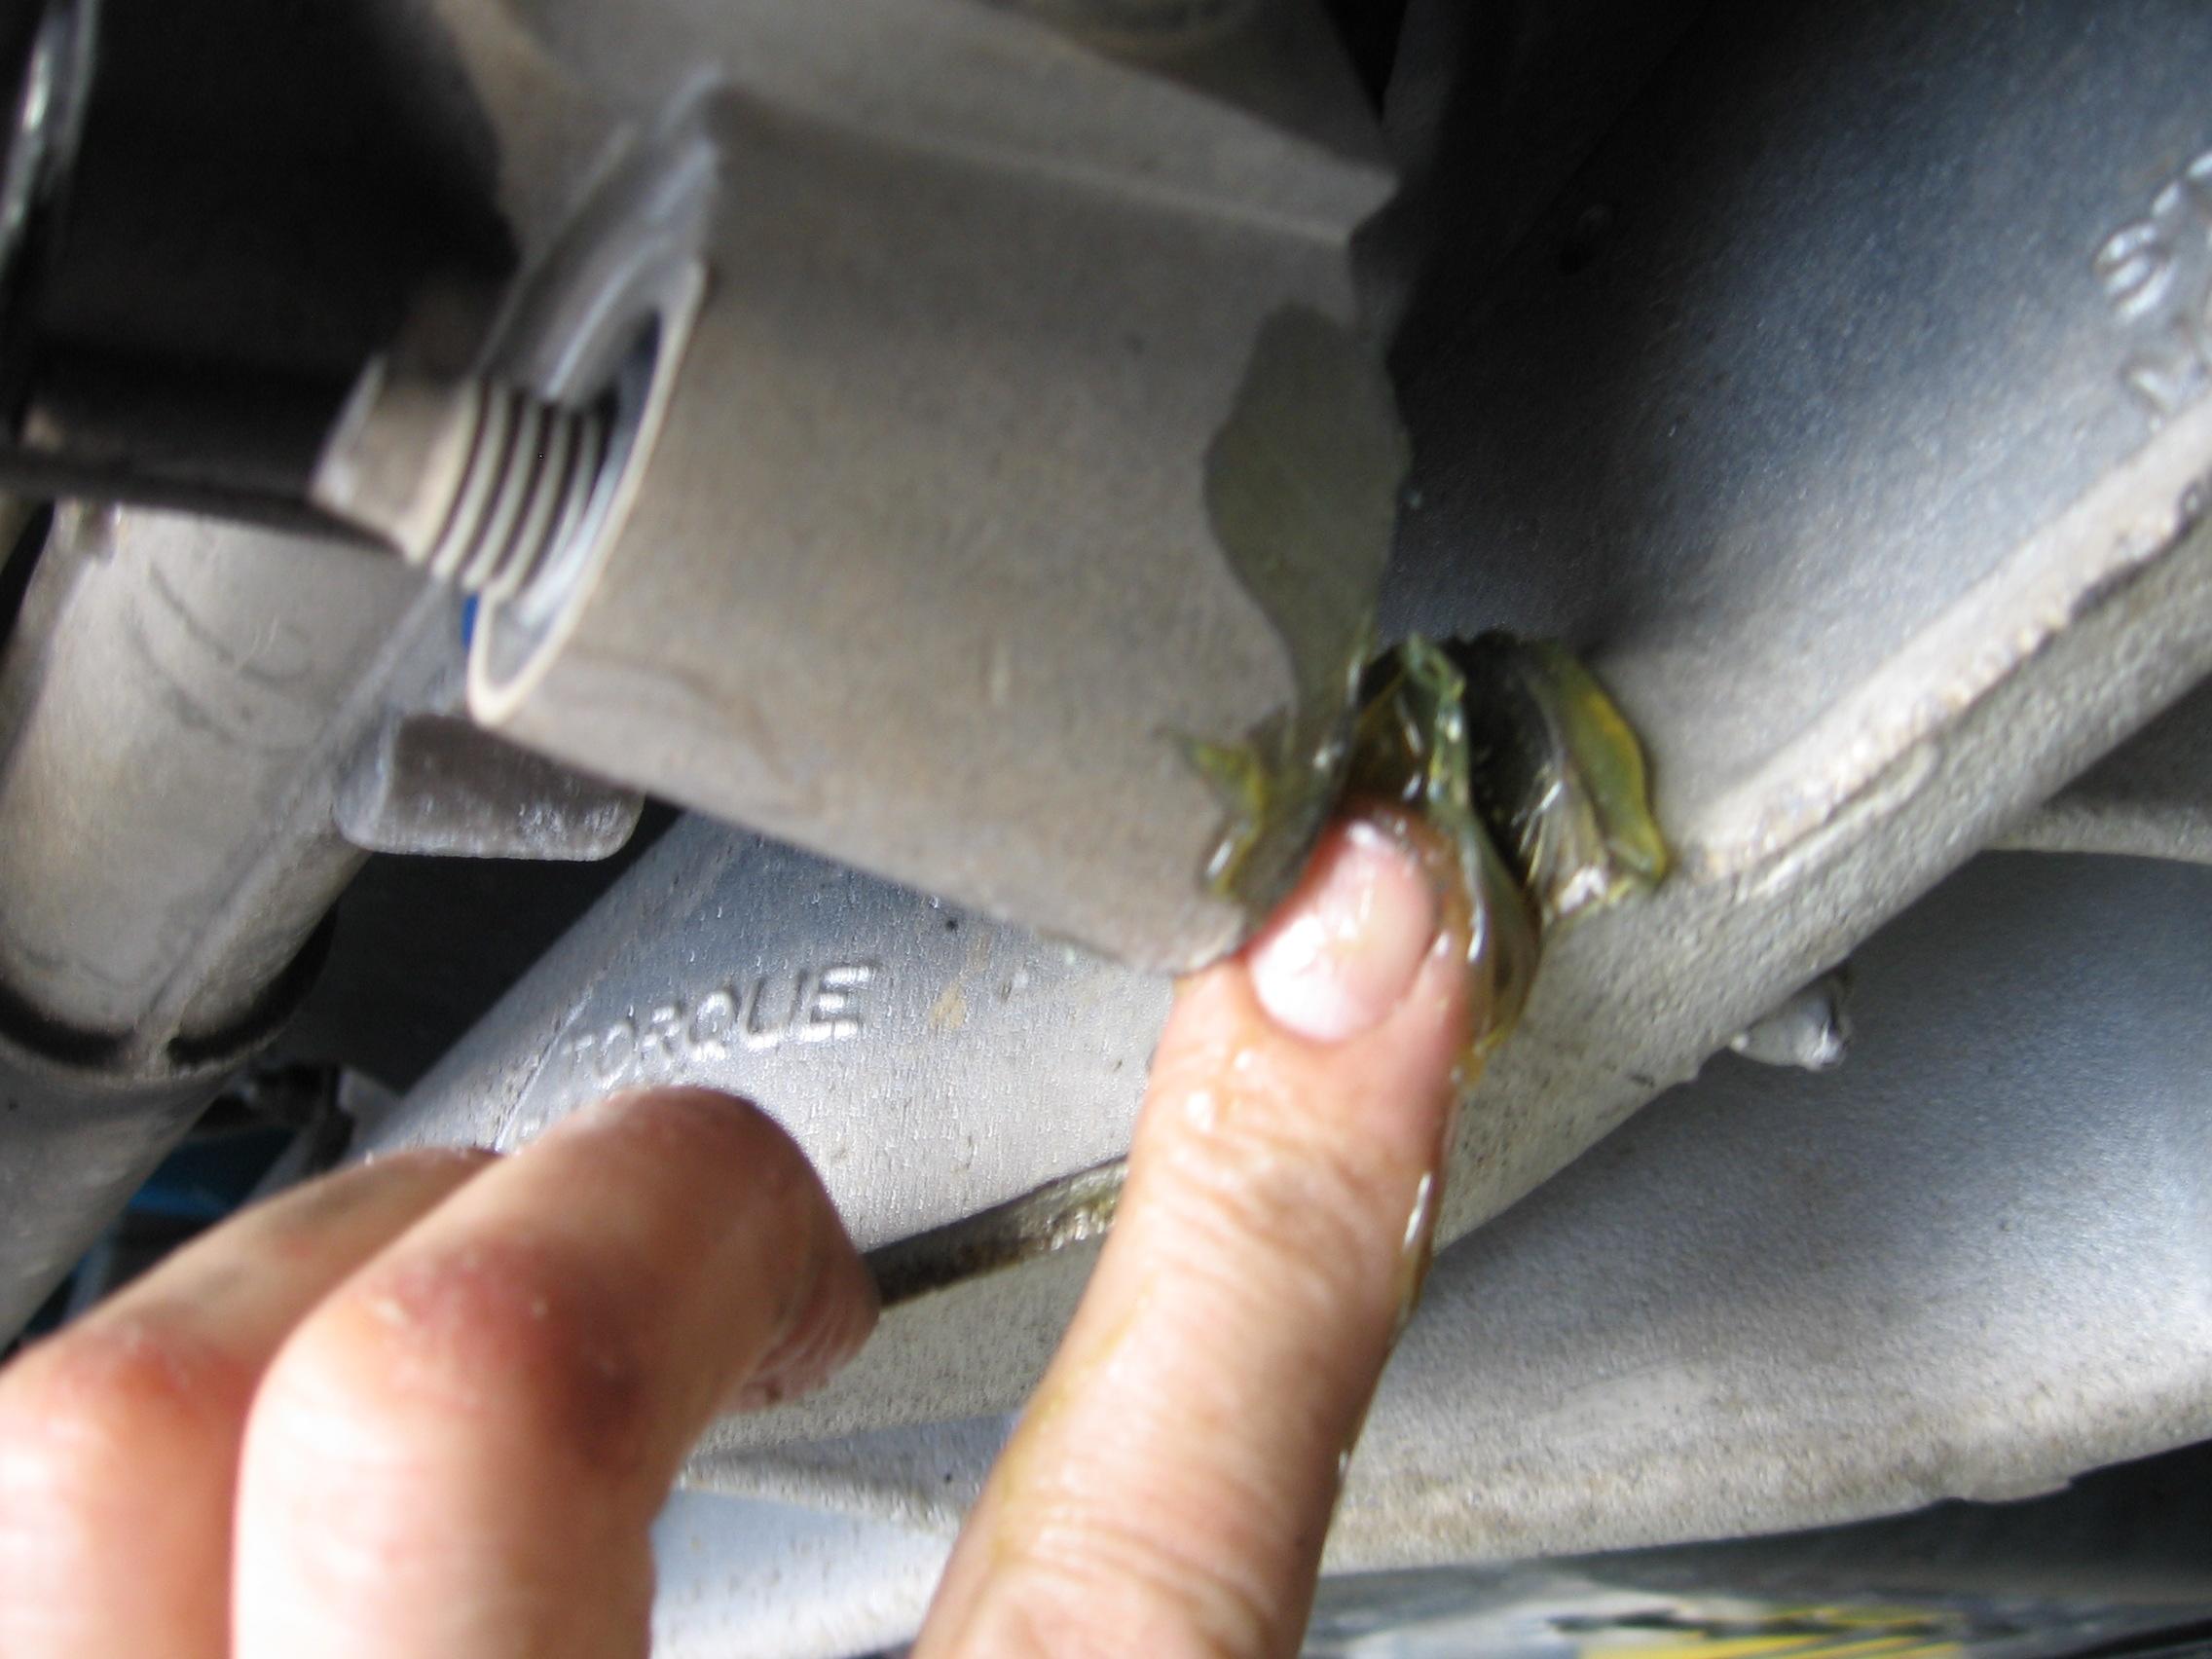 ford-ba-falcon-power-steering-rack-grease-on-rhs-mounting-stud..jpg